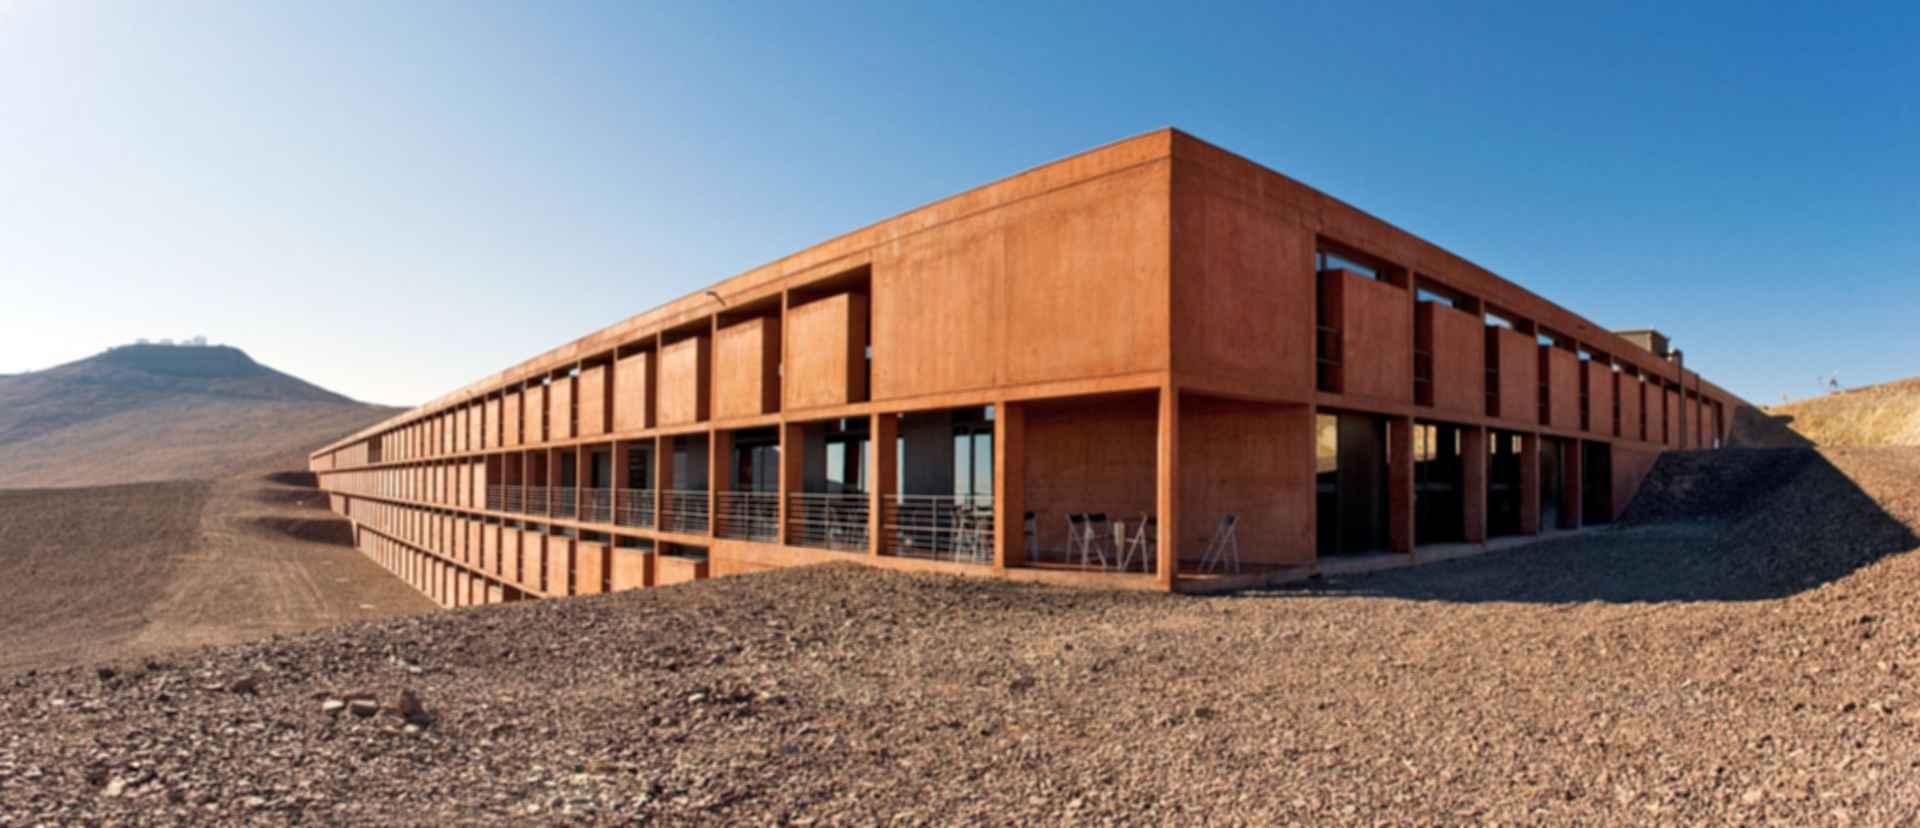 Residencia Paranal - Exterior/Landscape